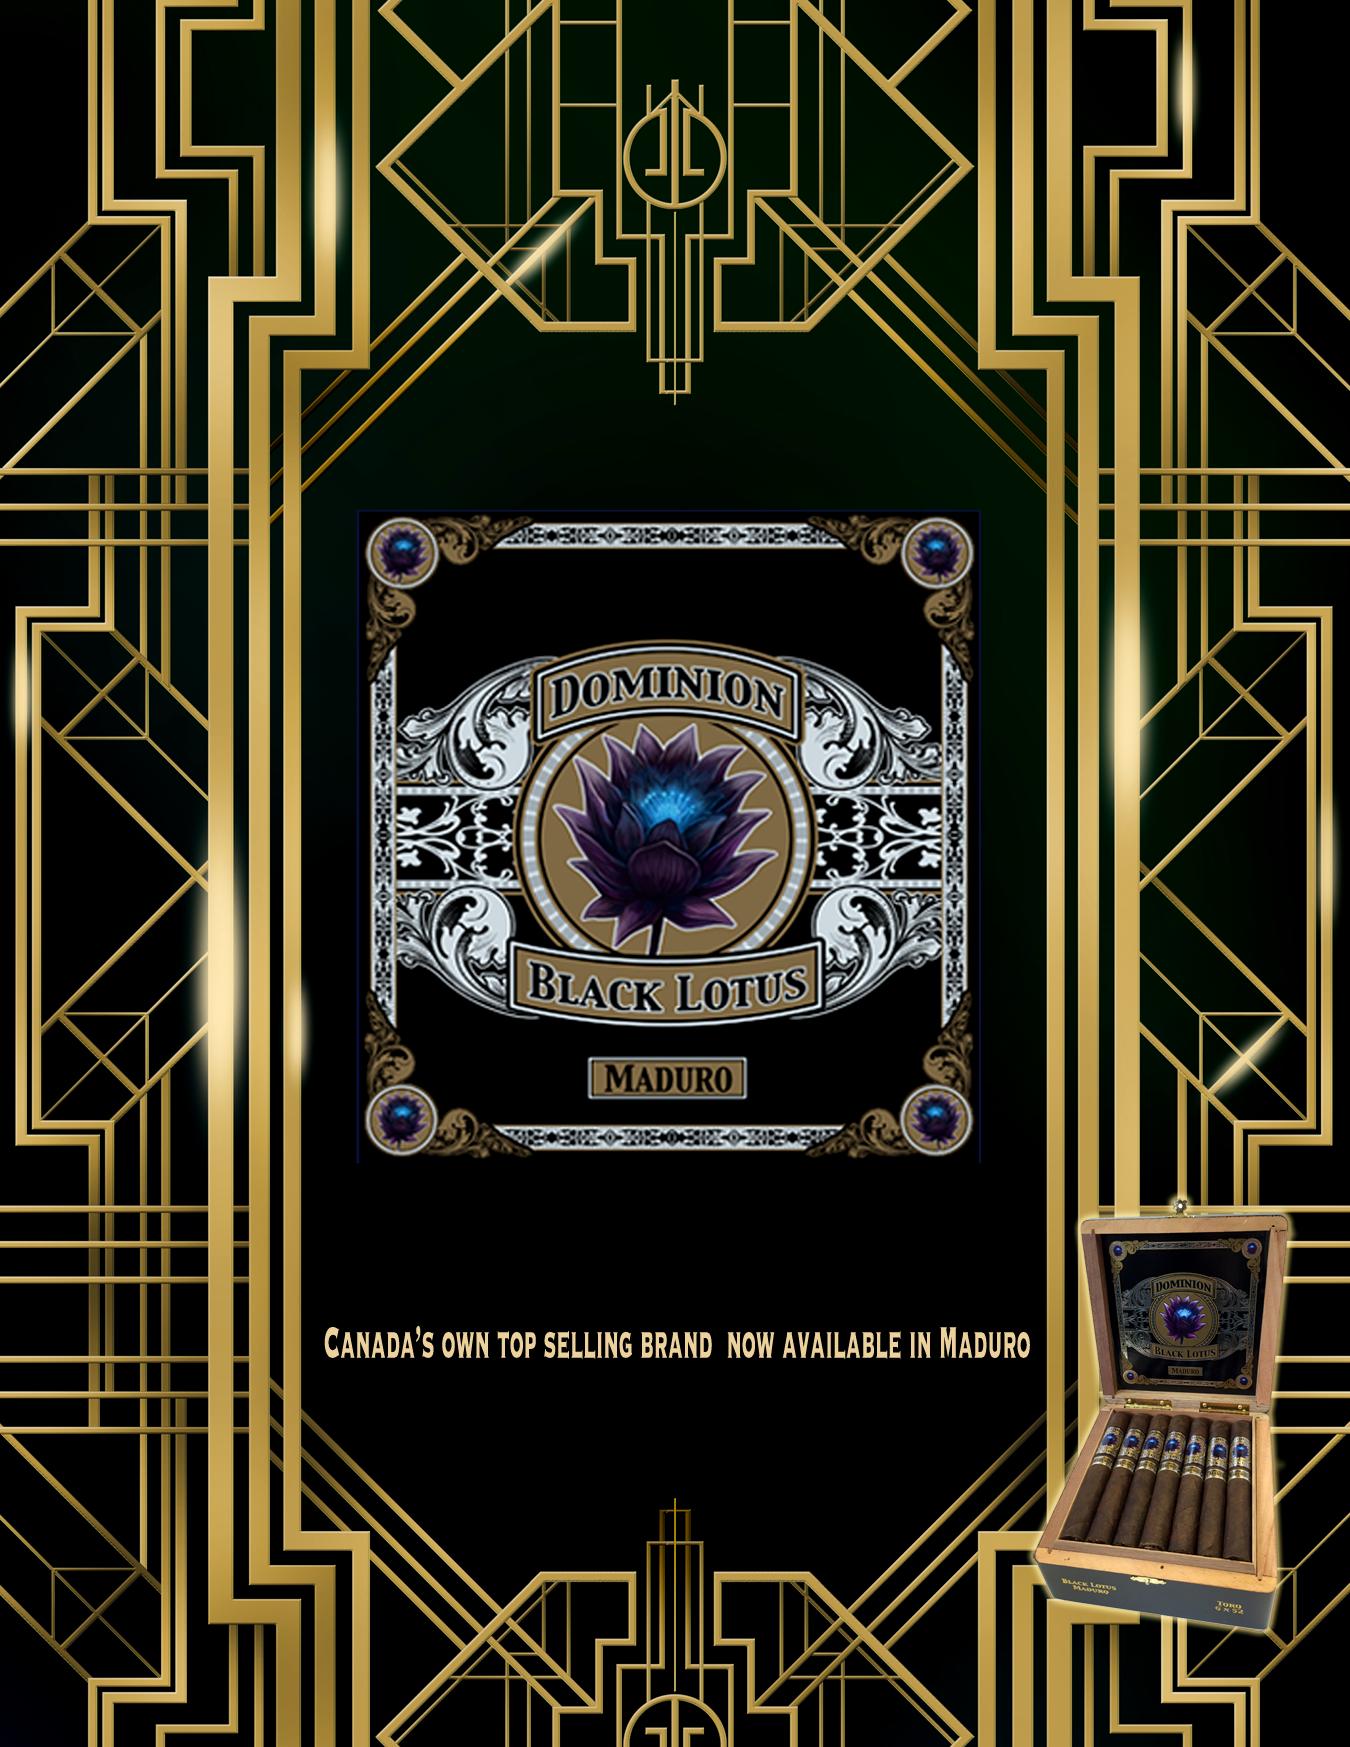 Dominion Black Lotus Moduro Poster Web 1